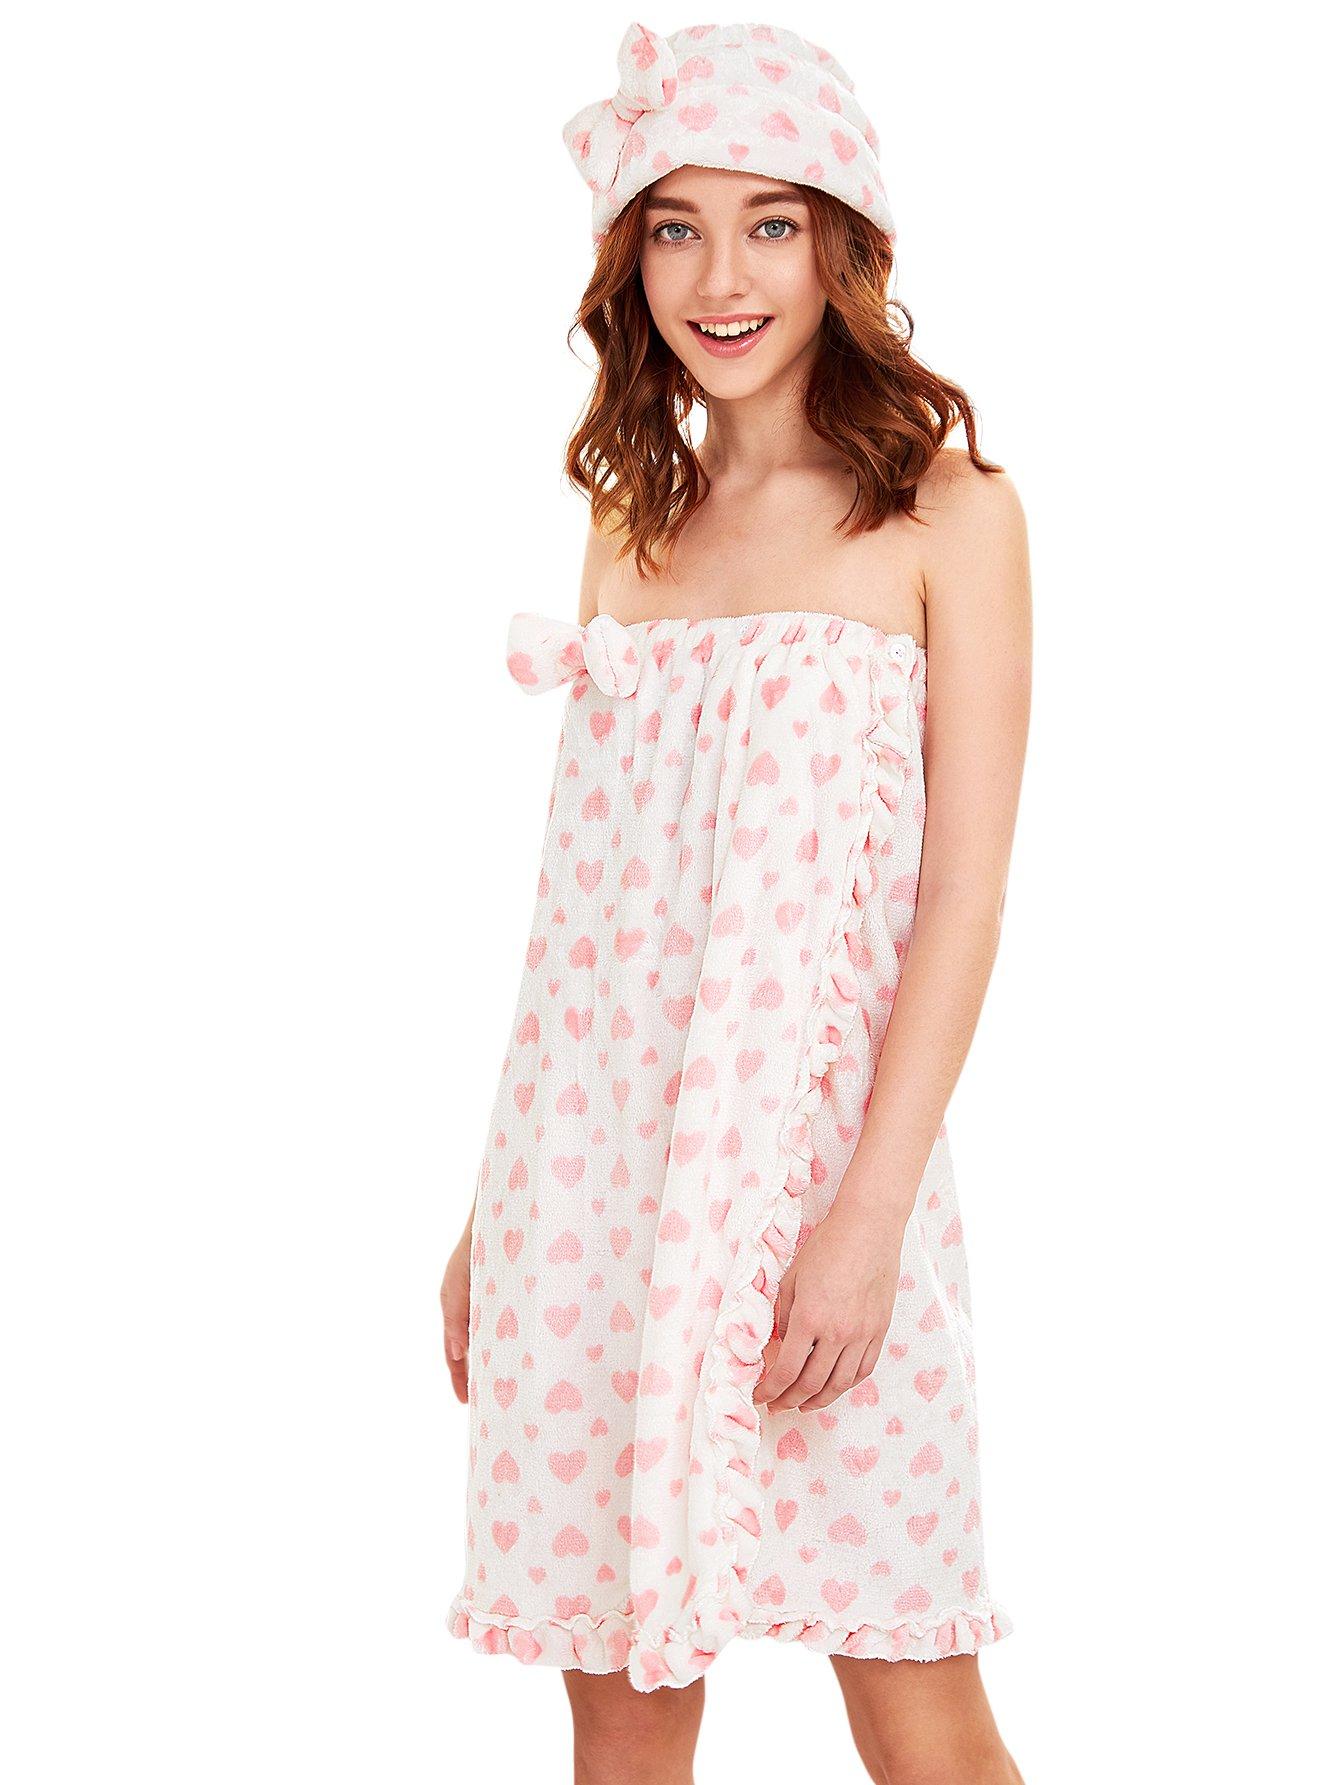 Romwe Women's Ruffle Cute Spa Bathroom Wrap Towel With Shower Cap Pink Heart One-Size